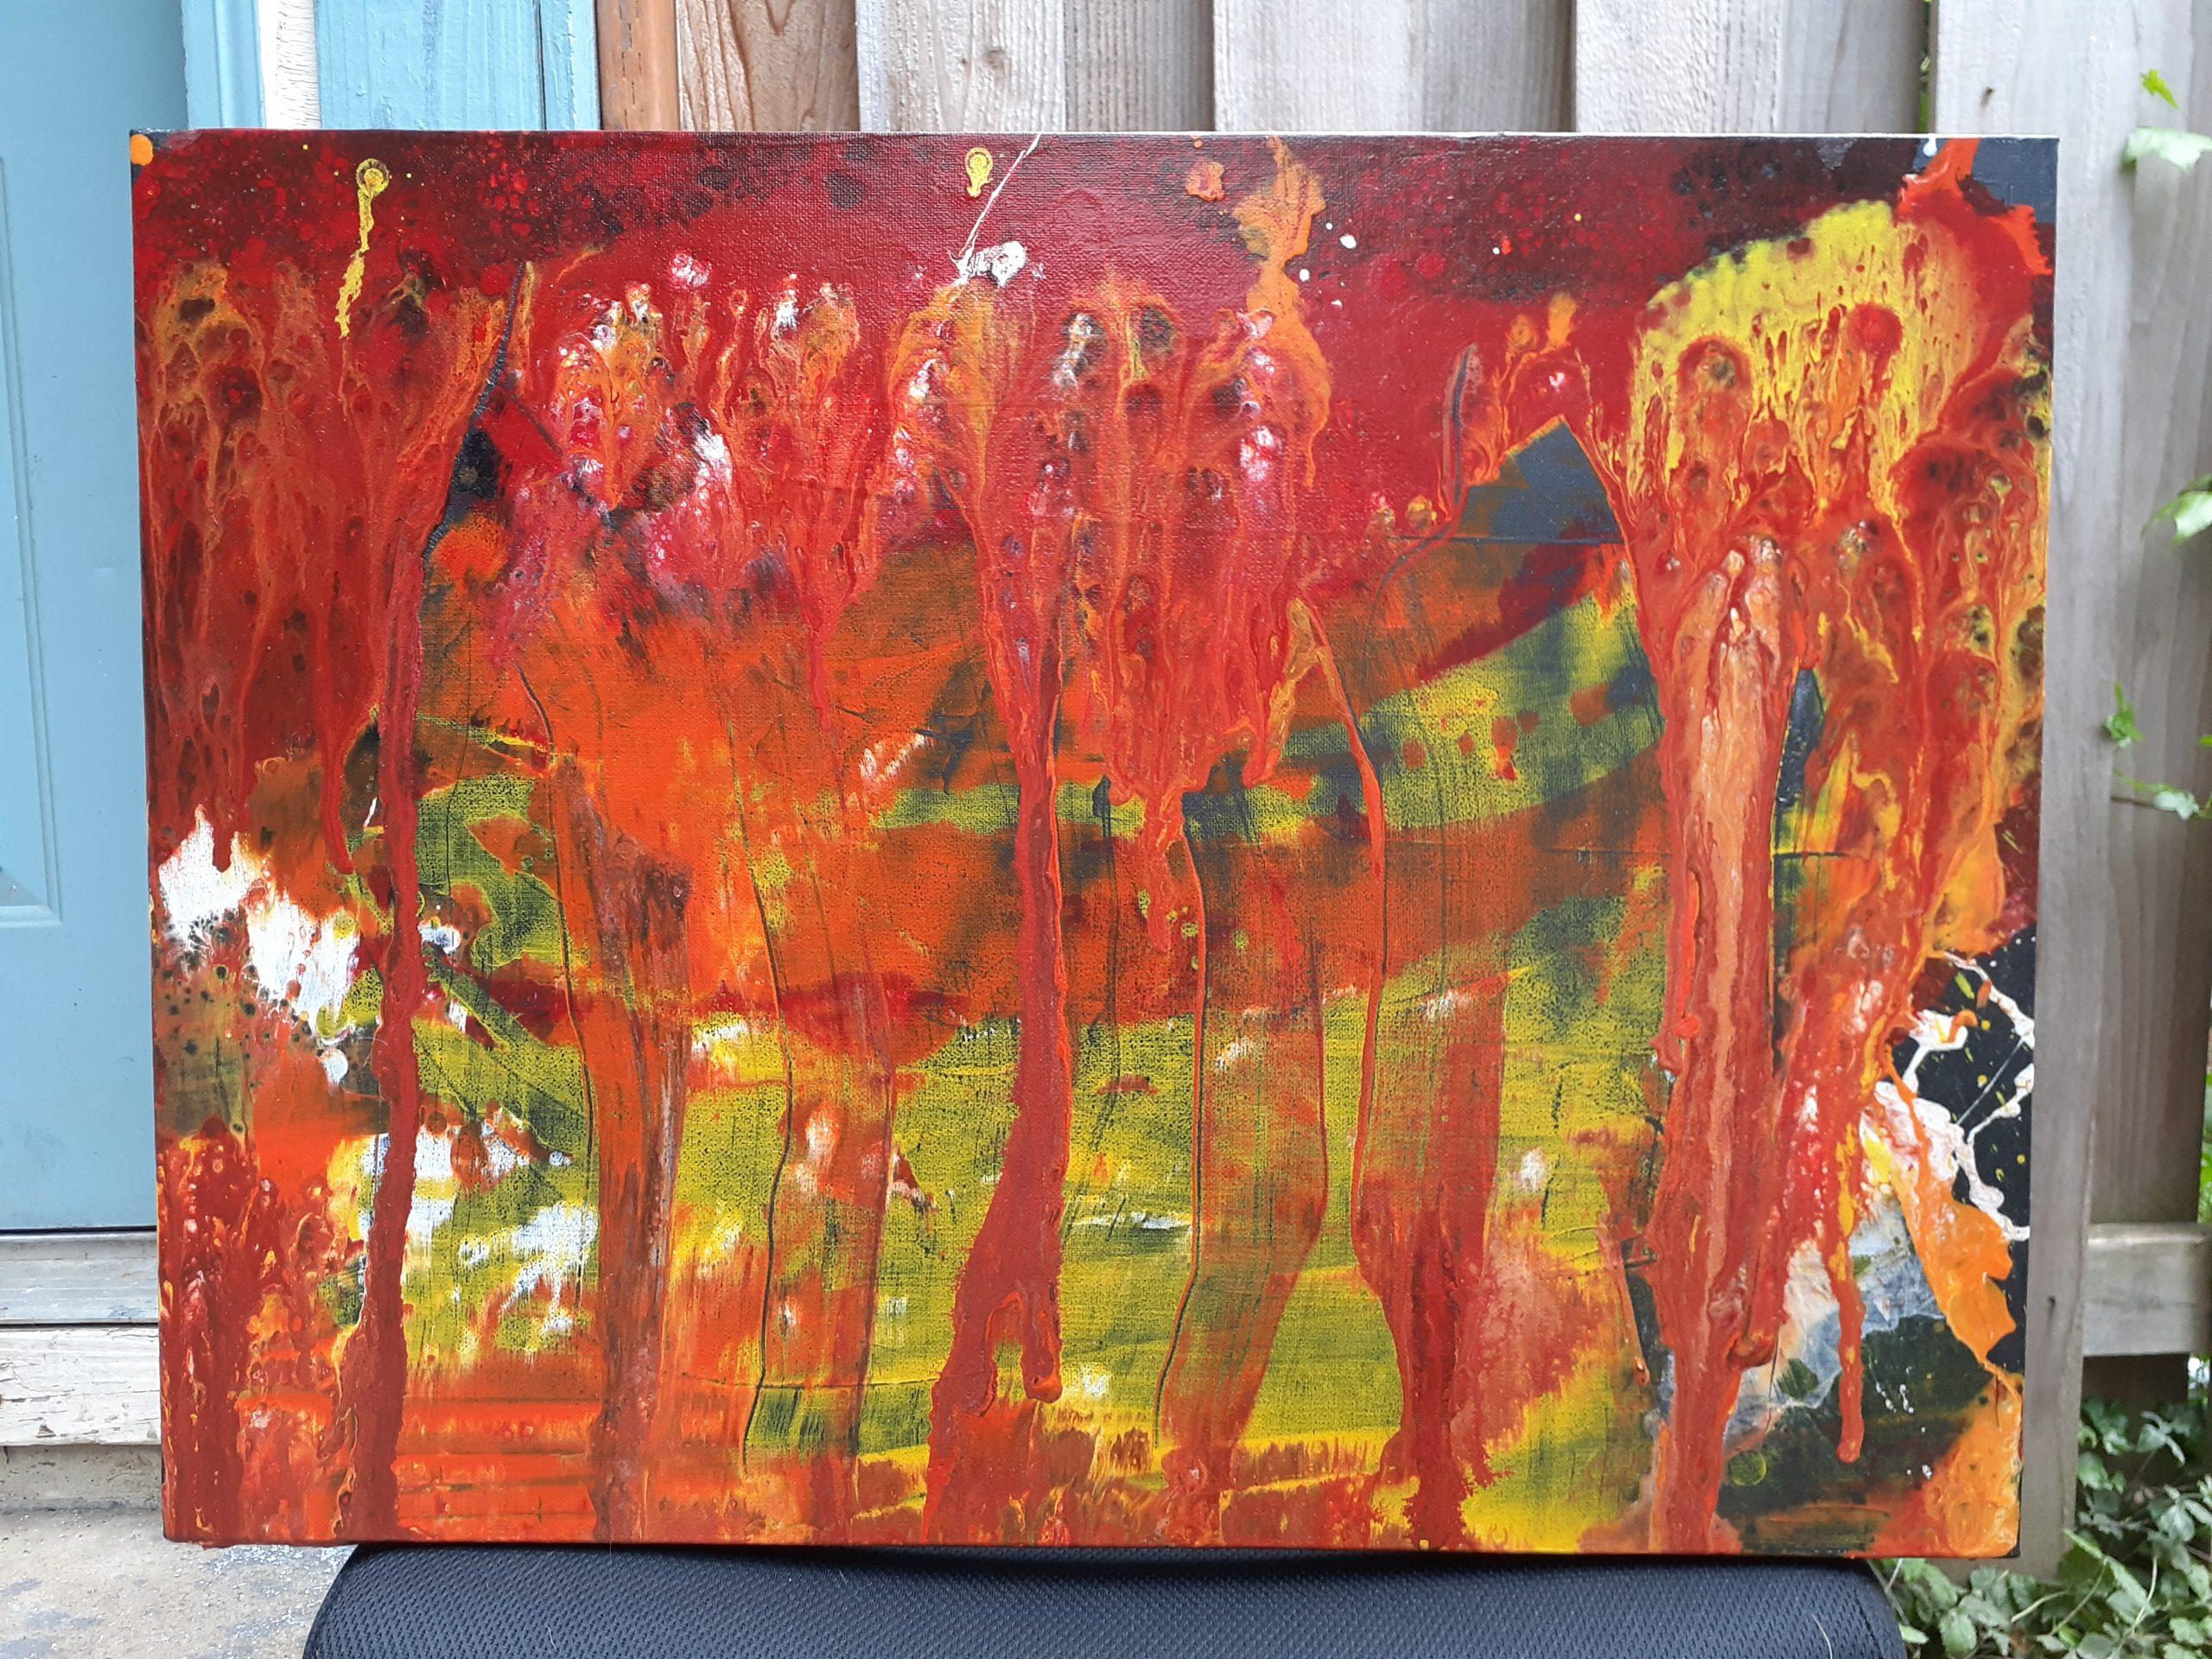 "Ashleigh Pearl; On Fire, 2020; Acrylic on Canvas; 18 x 24""; Painting"